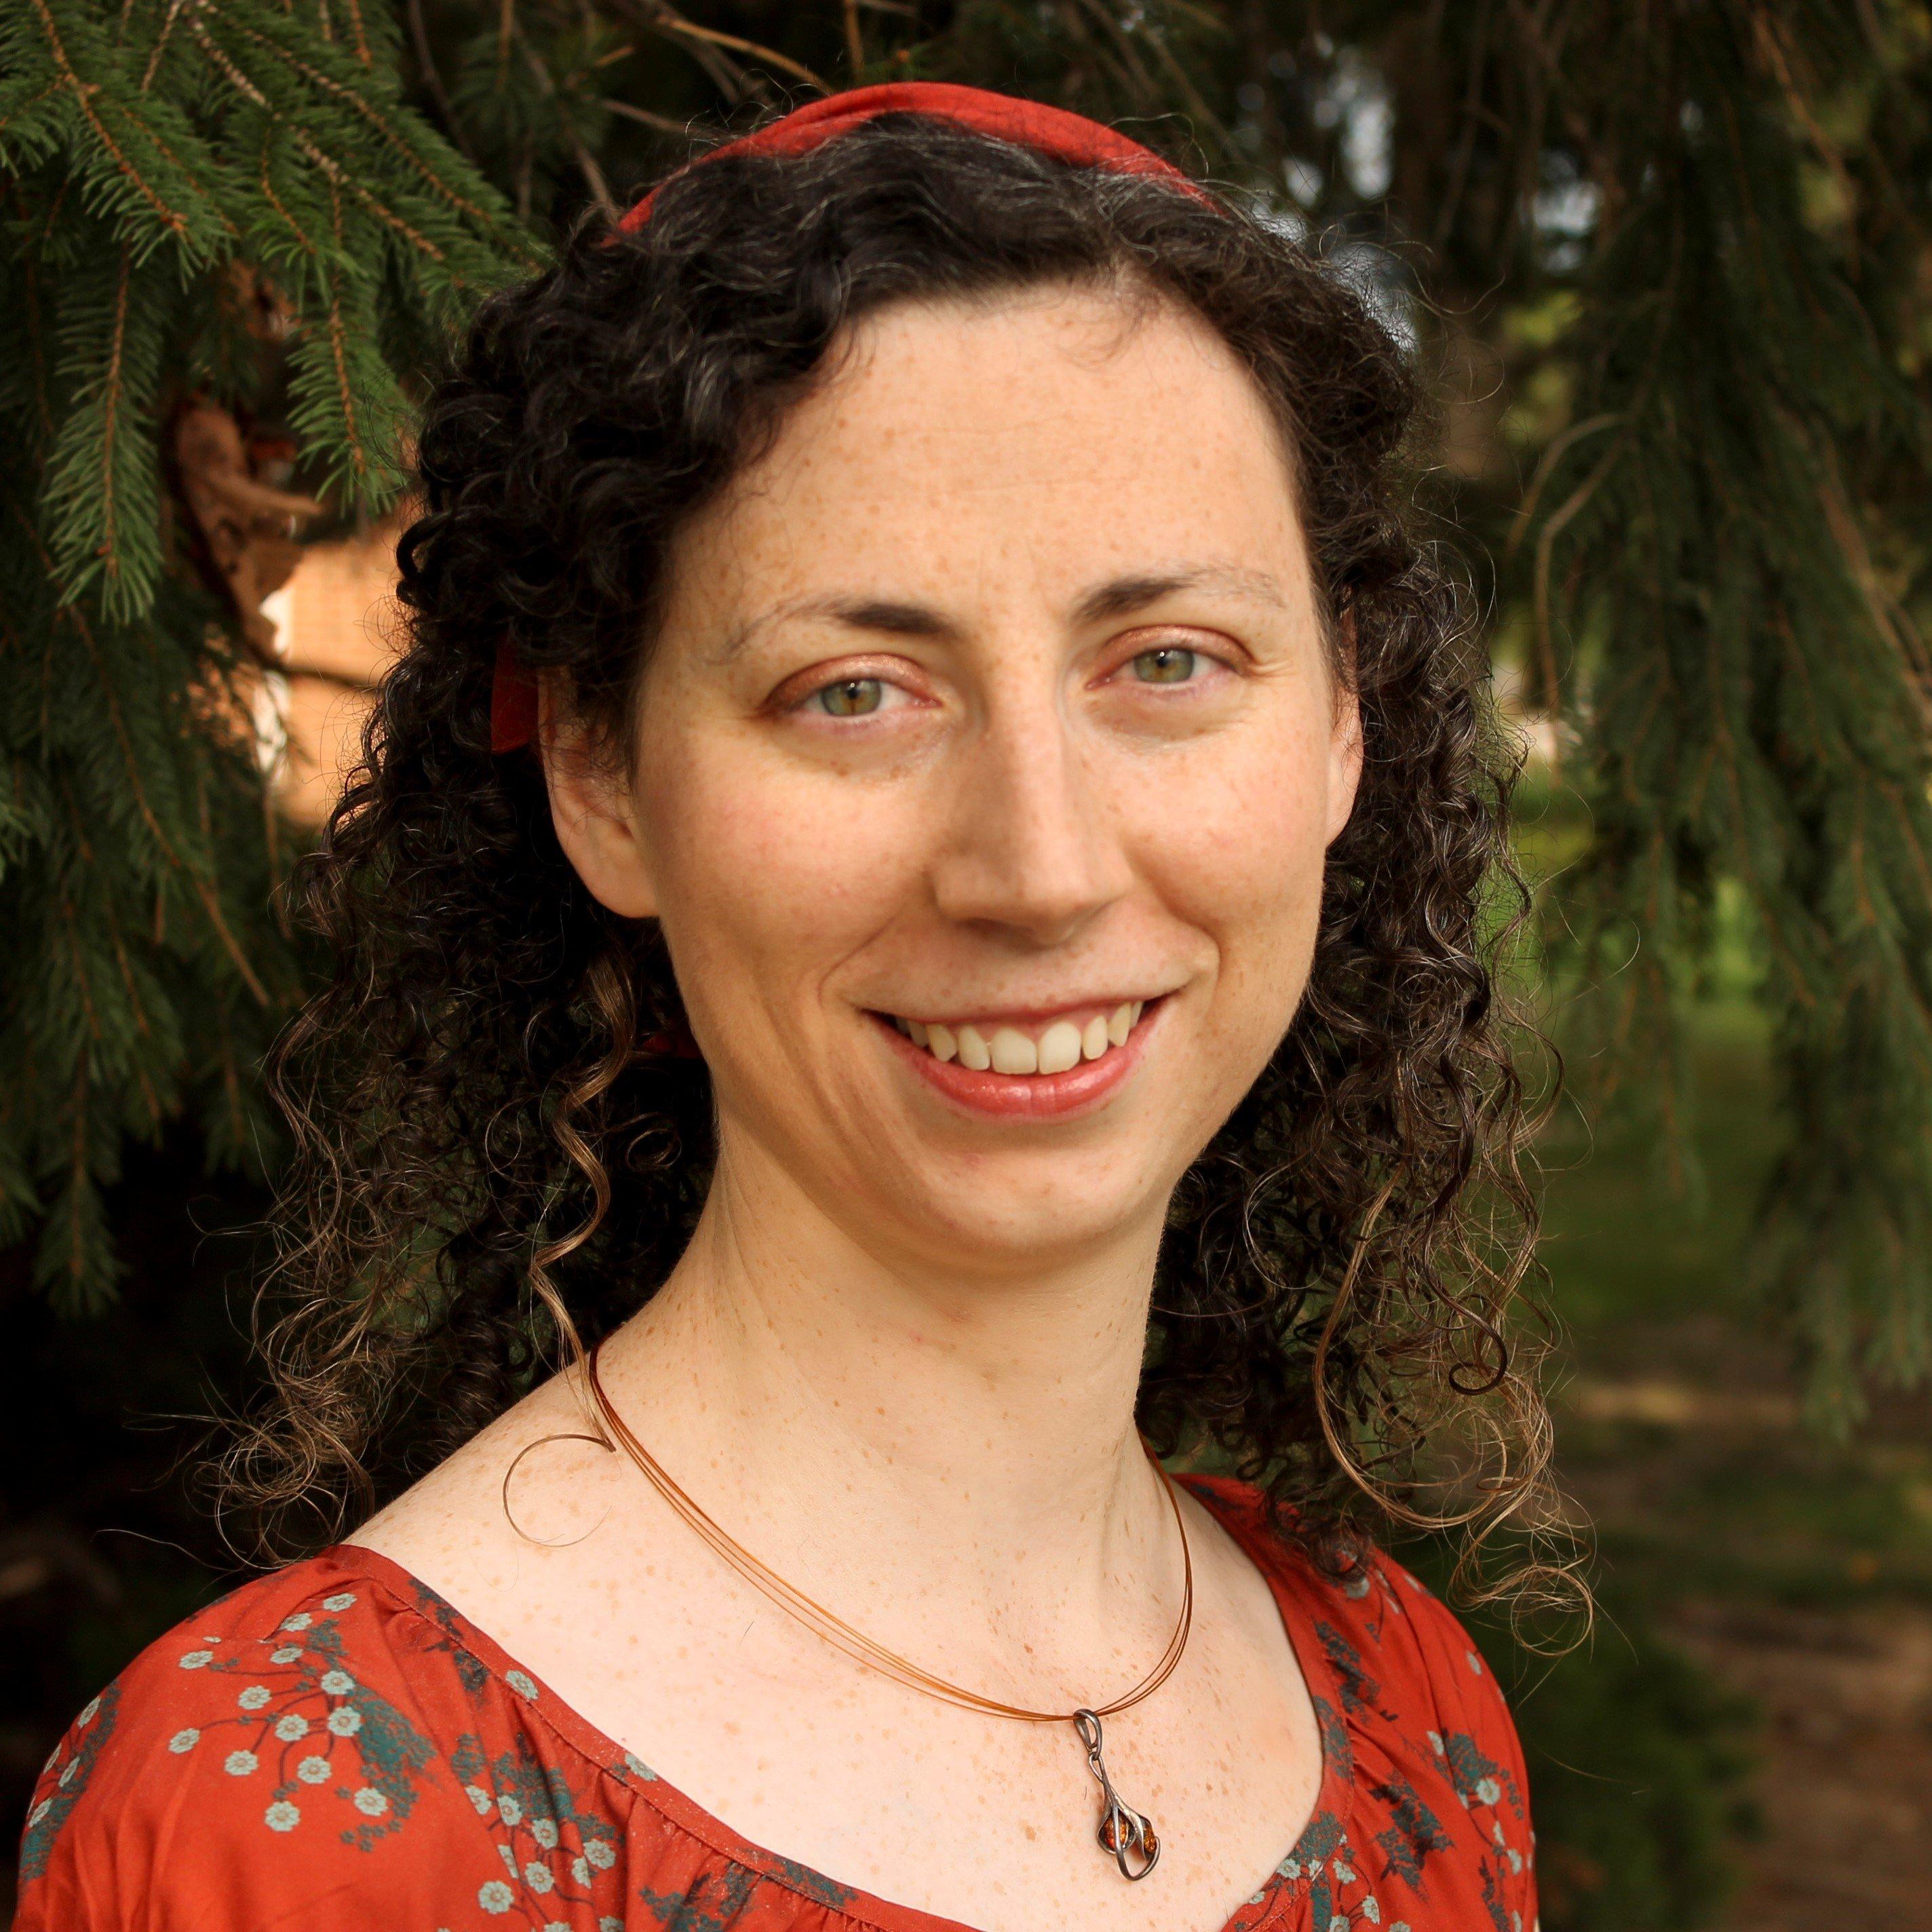 Laura Yiesla Art teacher at Clapham School